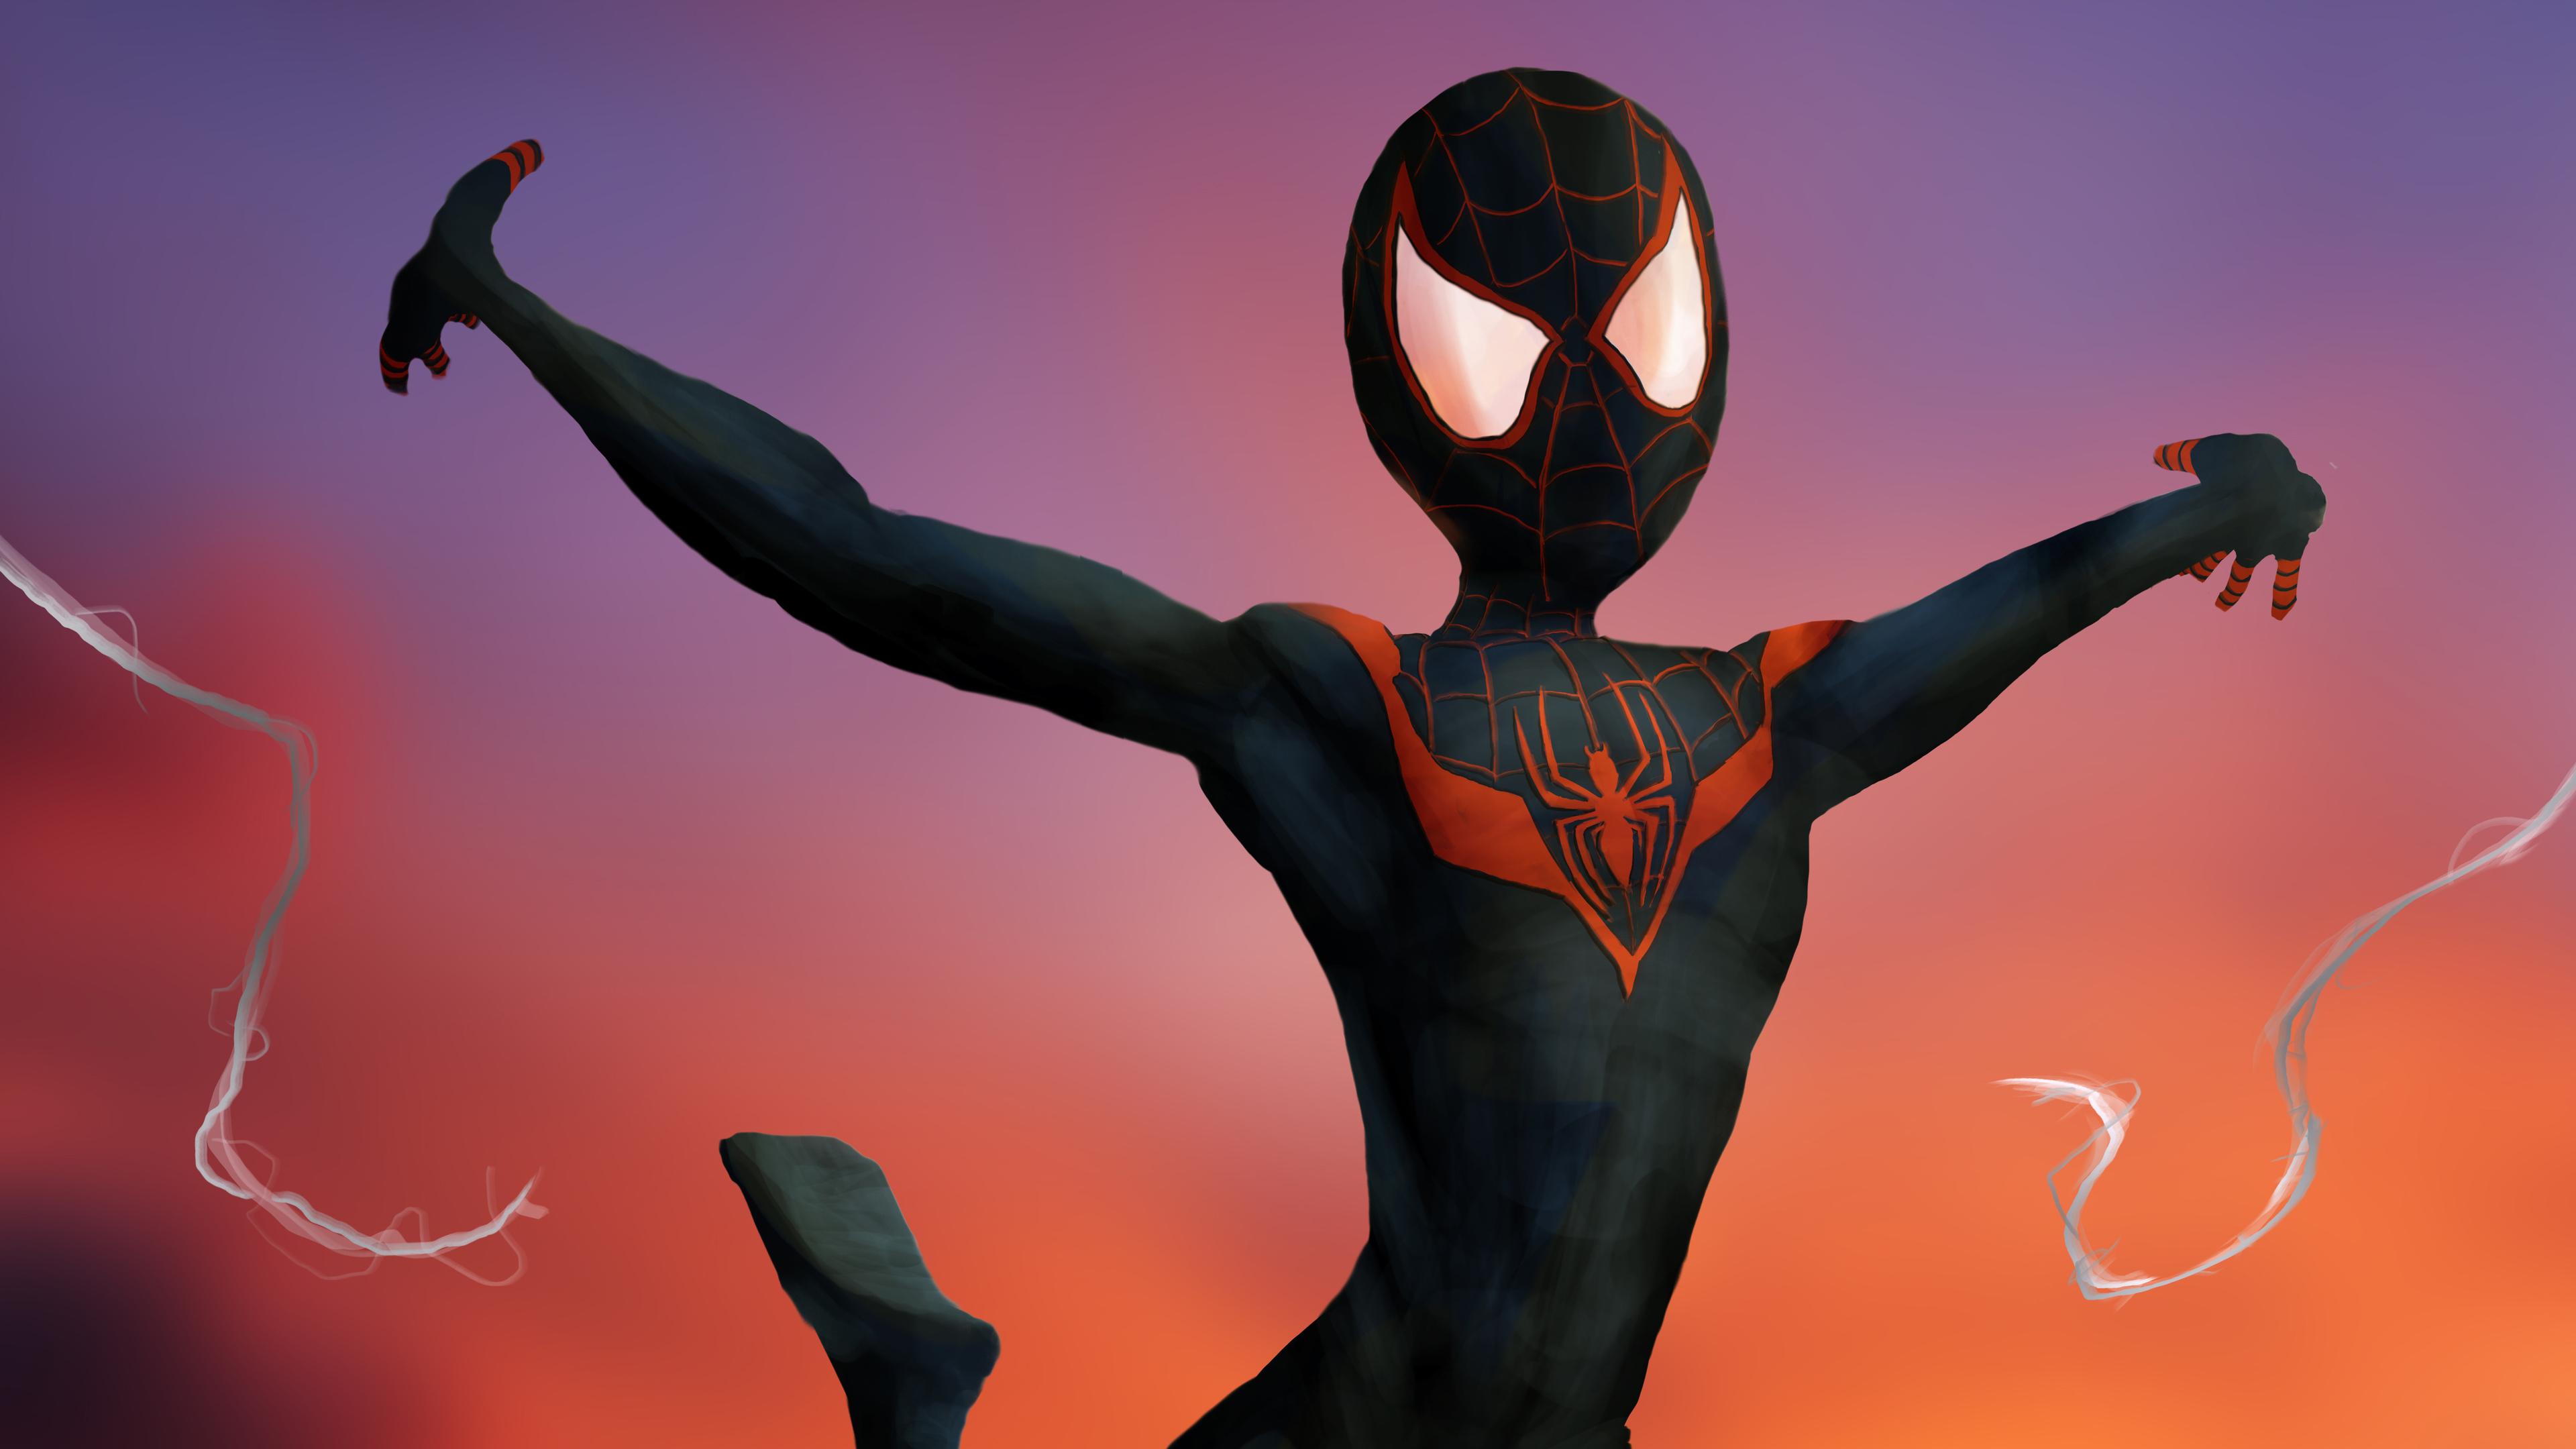 spiderman miles artwork 1557260120 - Spiderman Miles Artwork - superheroes wallpapers, spiderman wallpapers, spiderman into the spider verse wallpapers, hd-wallpapers, digital art wallpapers, deviantart wallpapers, artwork wallpapers, artist wallpapers, 4k-wallpapers